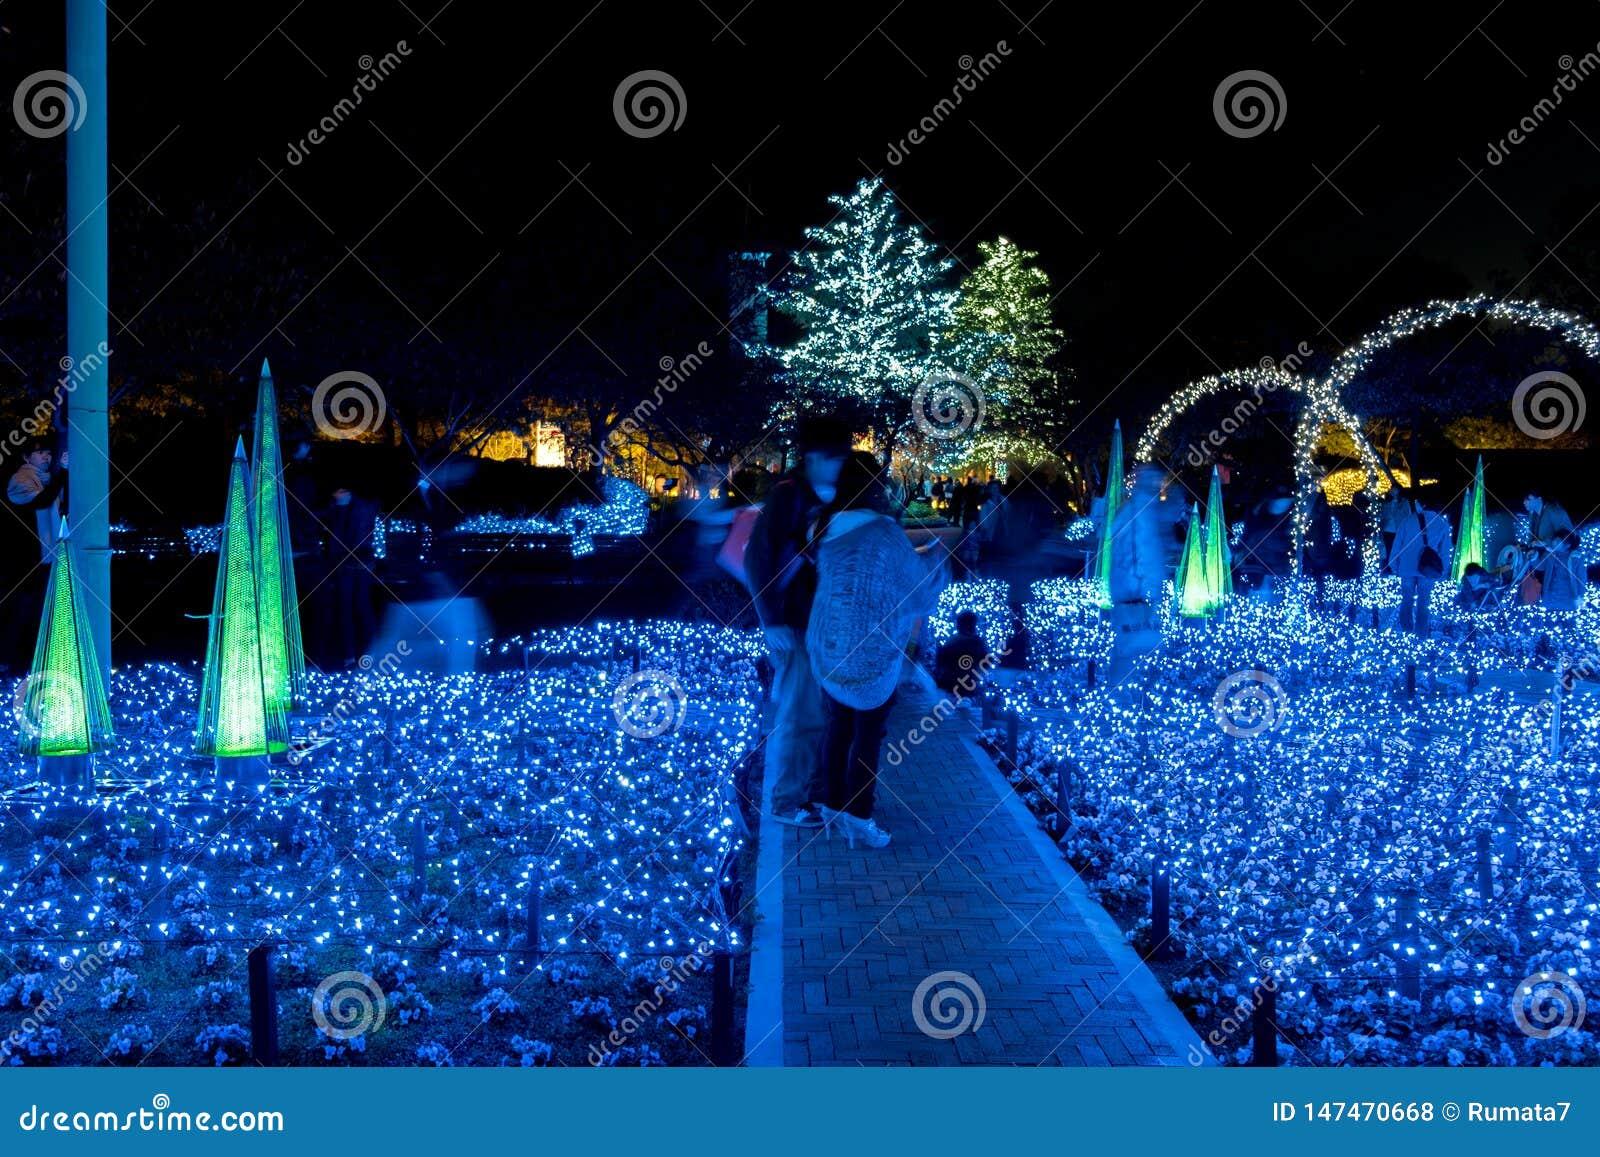 Nabana no Sato, light festival at Nagashima, Mie Prefecture